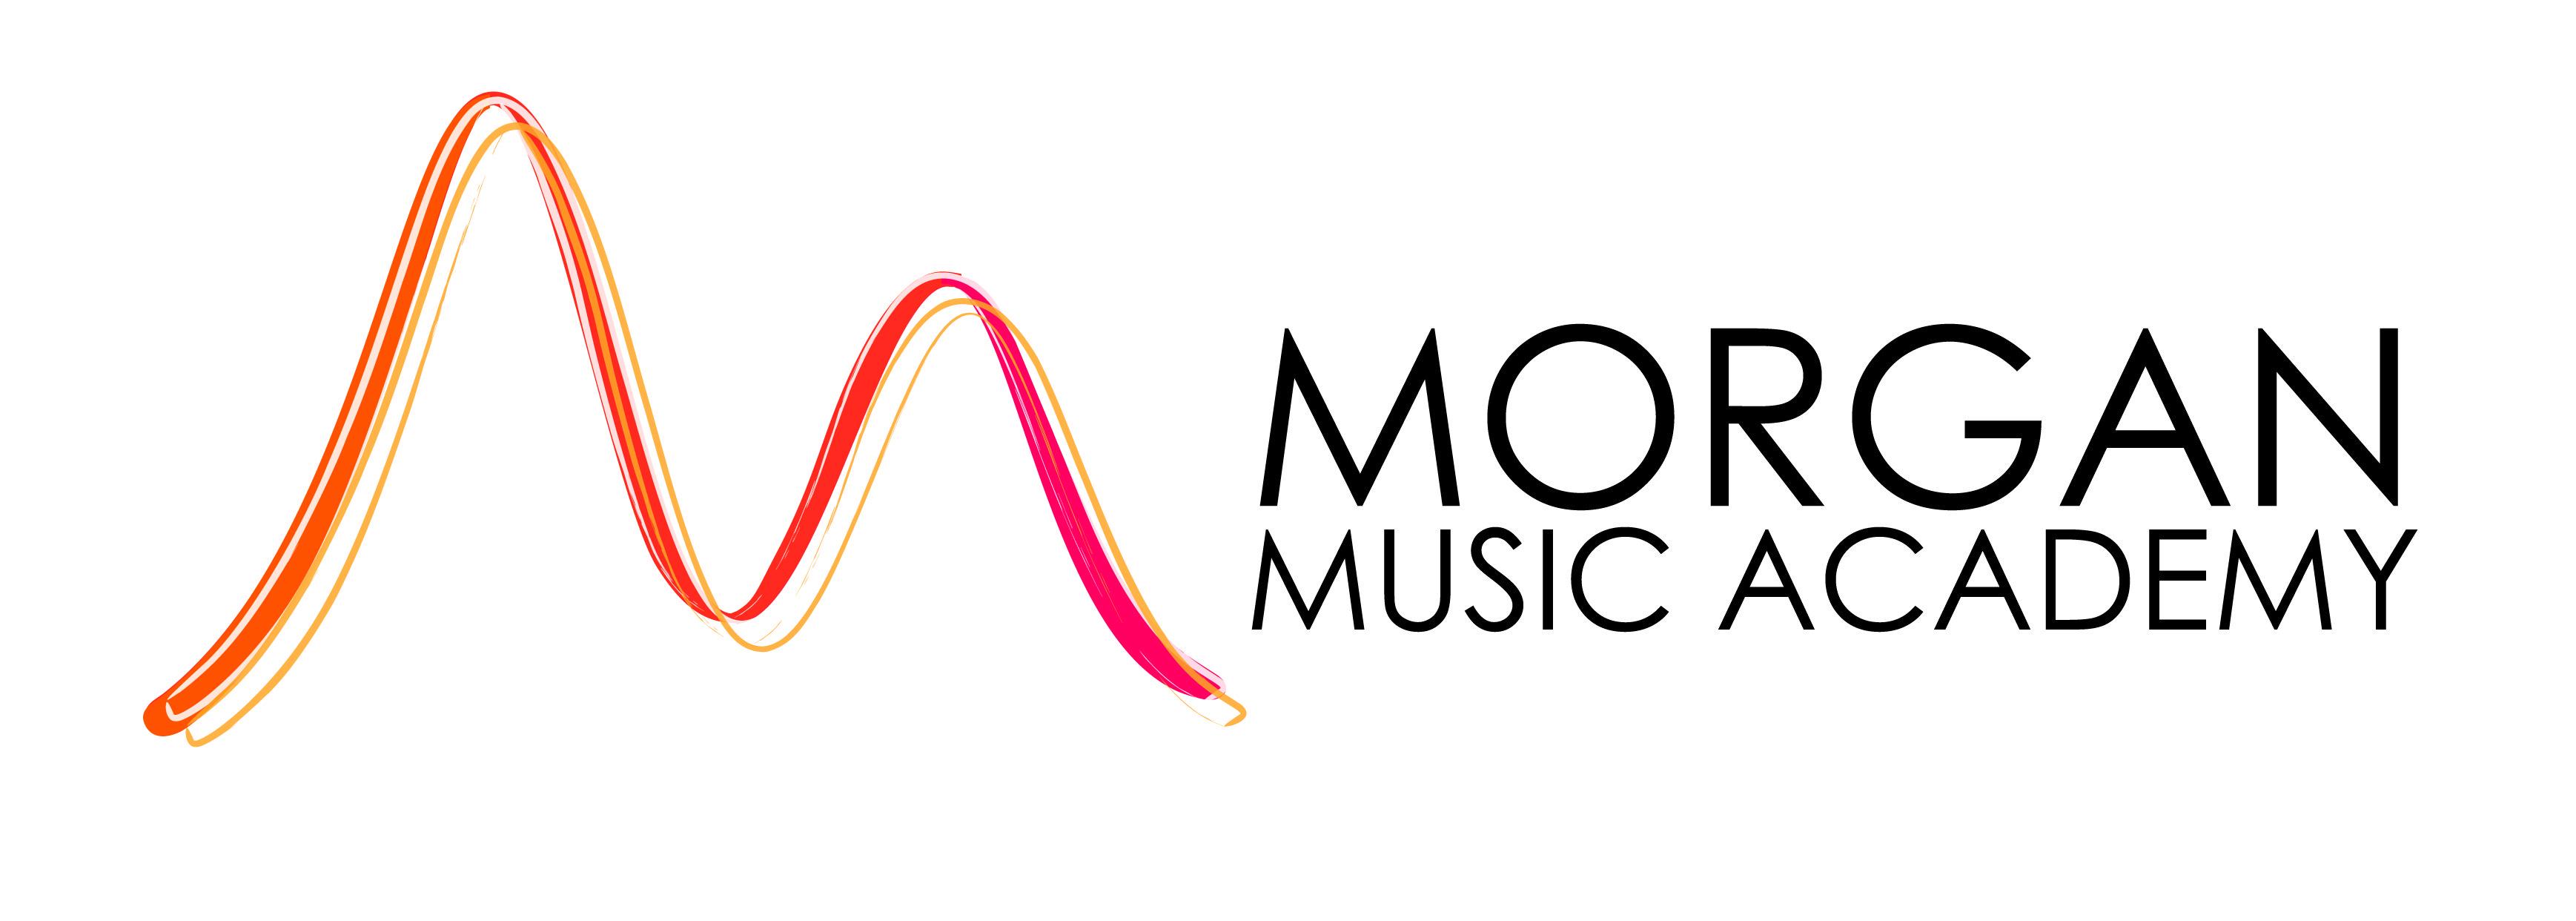 Monetary Voucher Morgan Music Academy Buy And Print Beautiful Gift